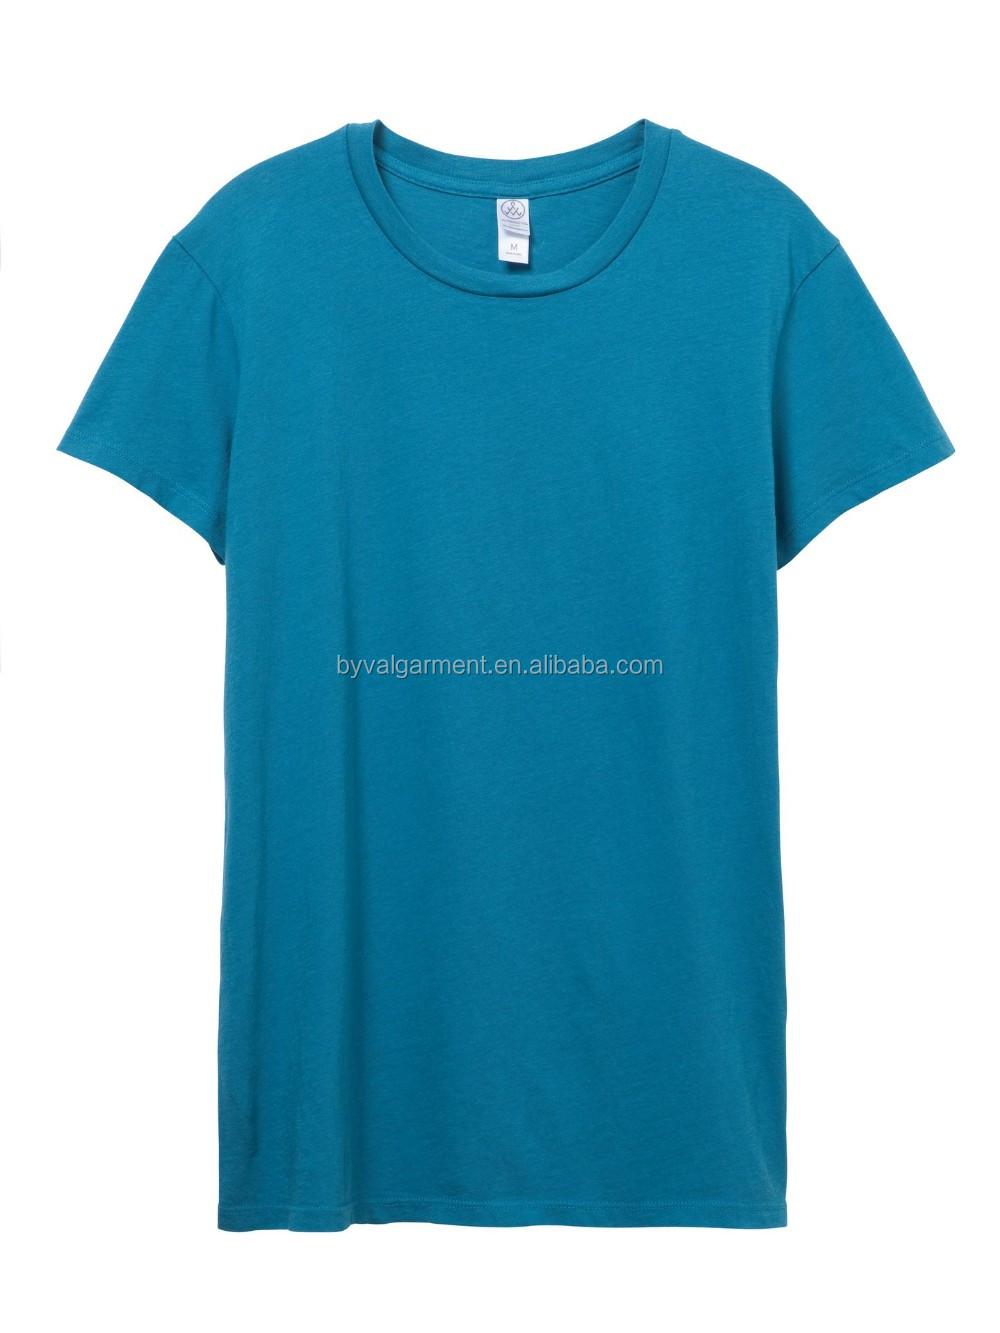 100% organic cotton Bulk plain t-shirts for women (11).jpg